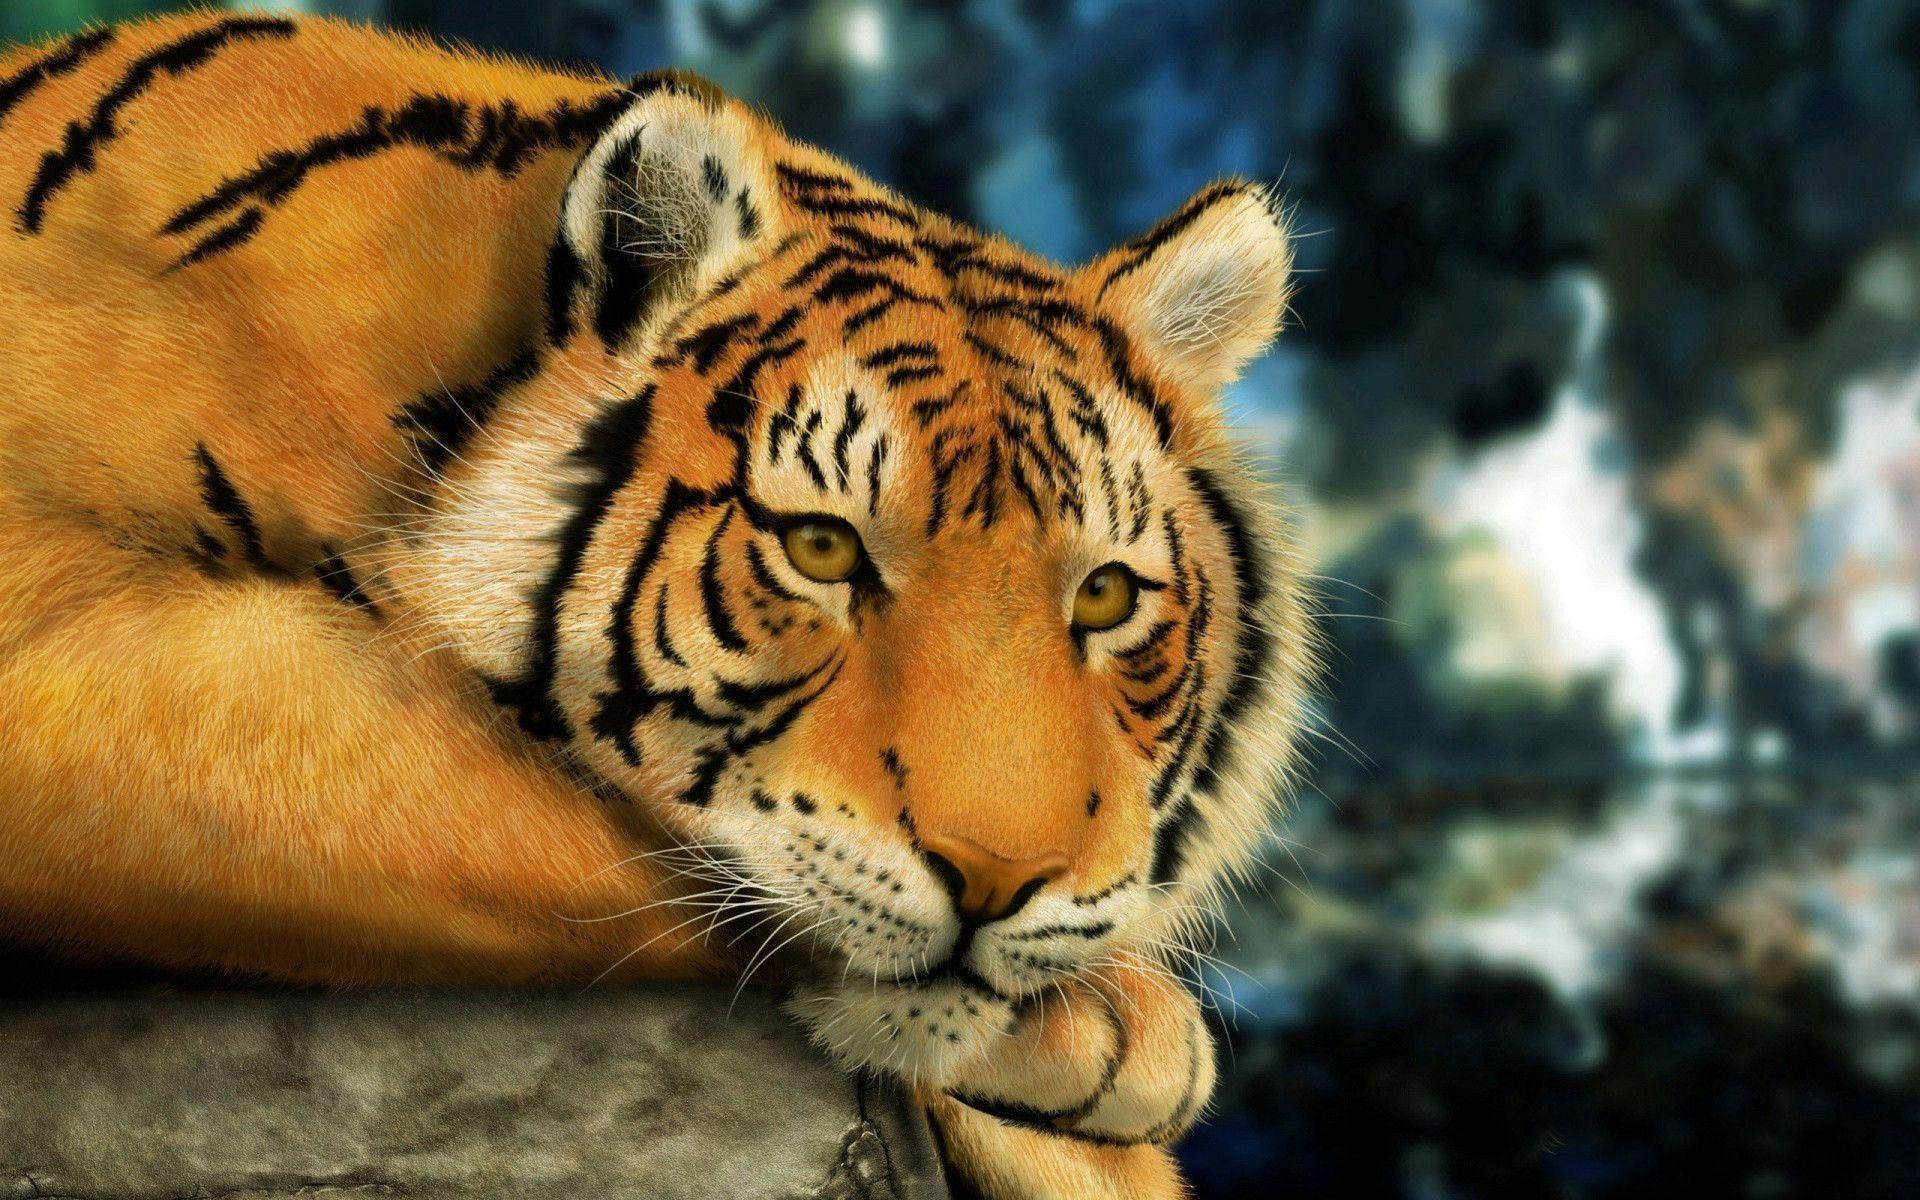 detroit tigers desktop wallpaper 1920x1080 (56+ images)